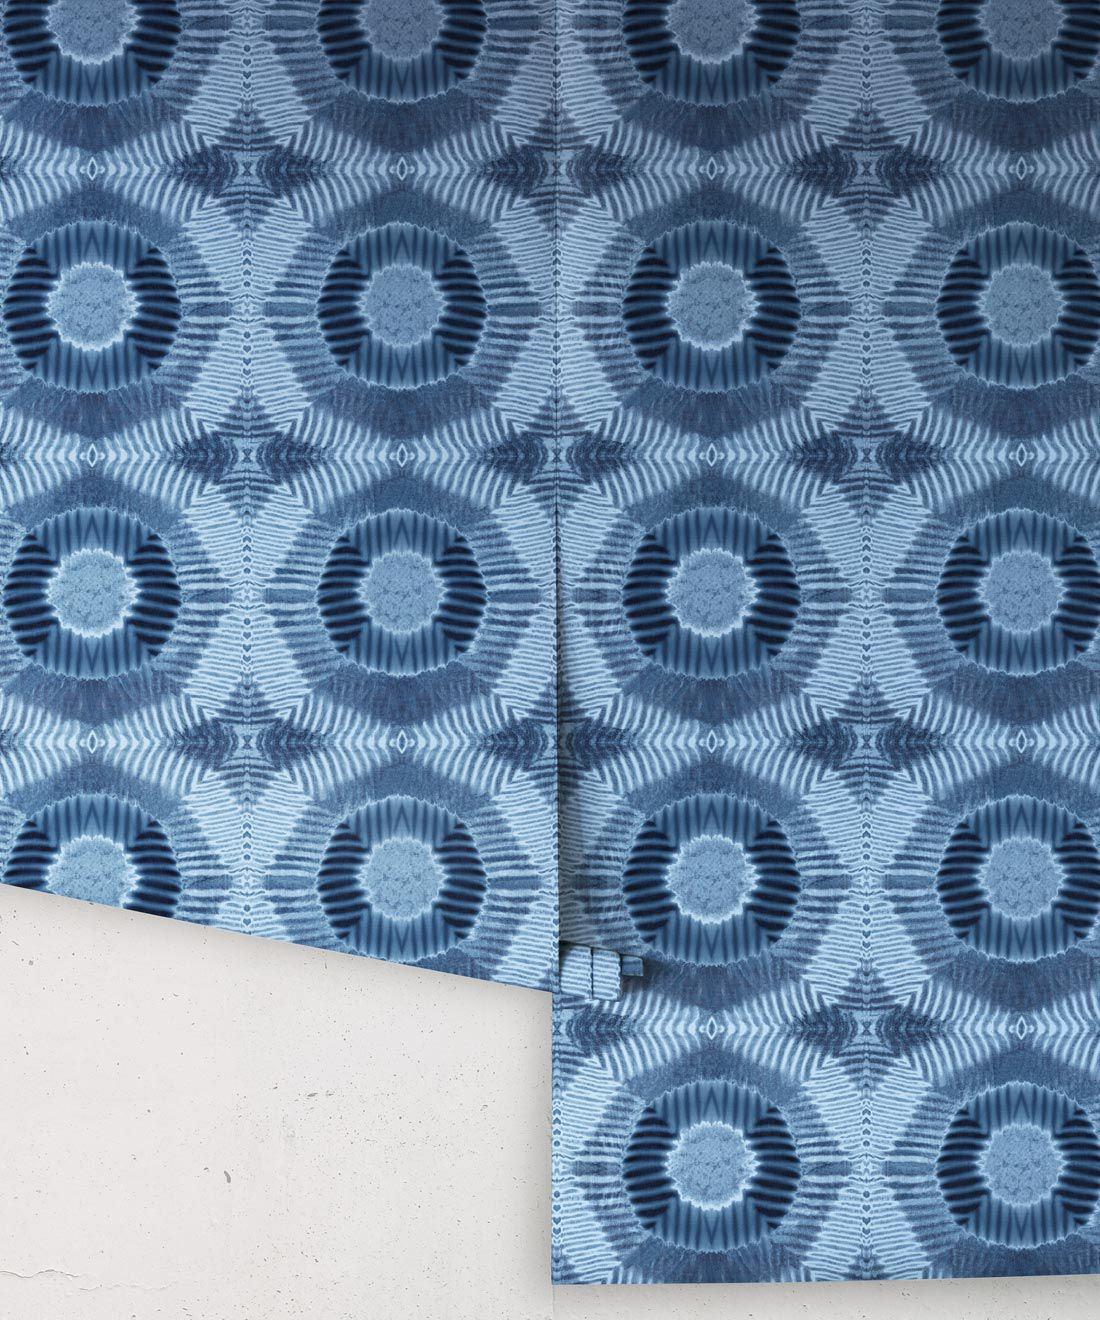 Aztec Suns Wallpaper Indigo Blue • Shibori Geometric • Rolls